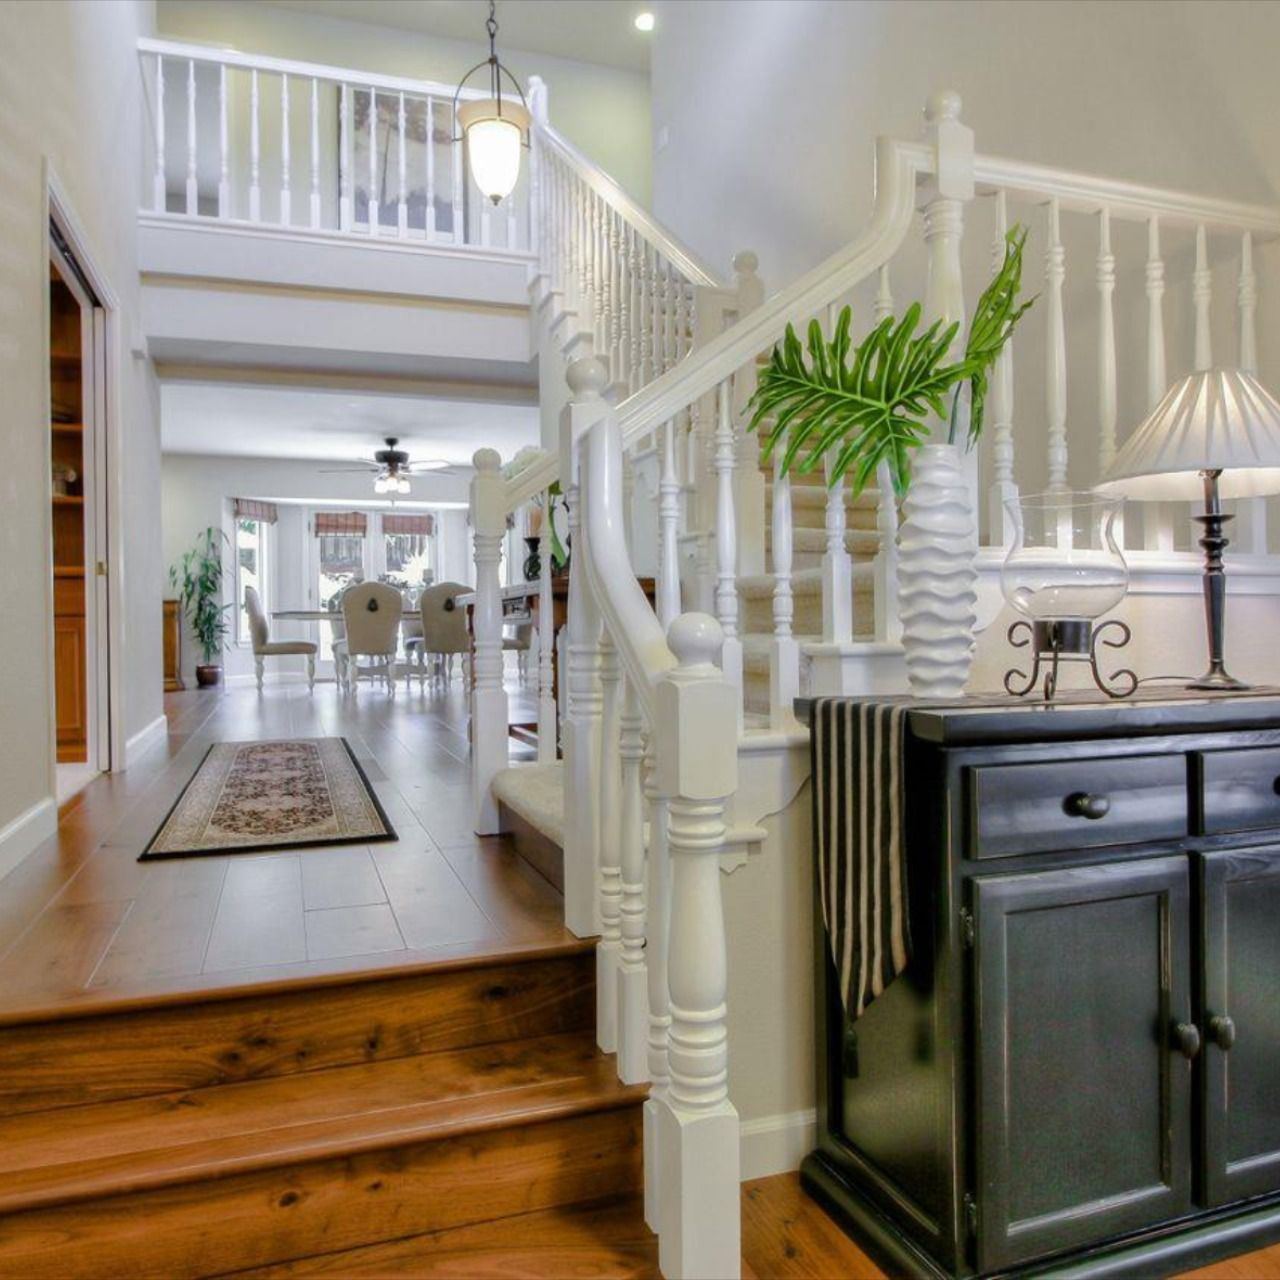 7278 Scarsdale Pl, San Jose, CA 95120 | $2,250,000 Courtesy of: Mark Chiavetta - Coldwell Banker Realty  Gary St Clair Associate Broker - Keller Williams Email: Gary@GaryStClair.com Direct: (408) 386-6321 Office: (408) 267-5350 www. GaryStClair.com  #garystclair #siliconvalleyrealestatehub #siliconvalleyre #homeforsaleinsanjose #homesforsale #houseforsale #homes #SanJoseHome #siliconvalley #kellerwilliams